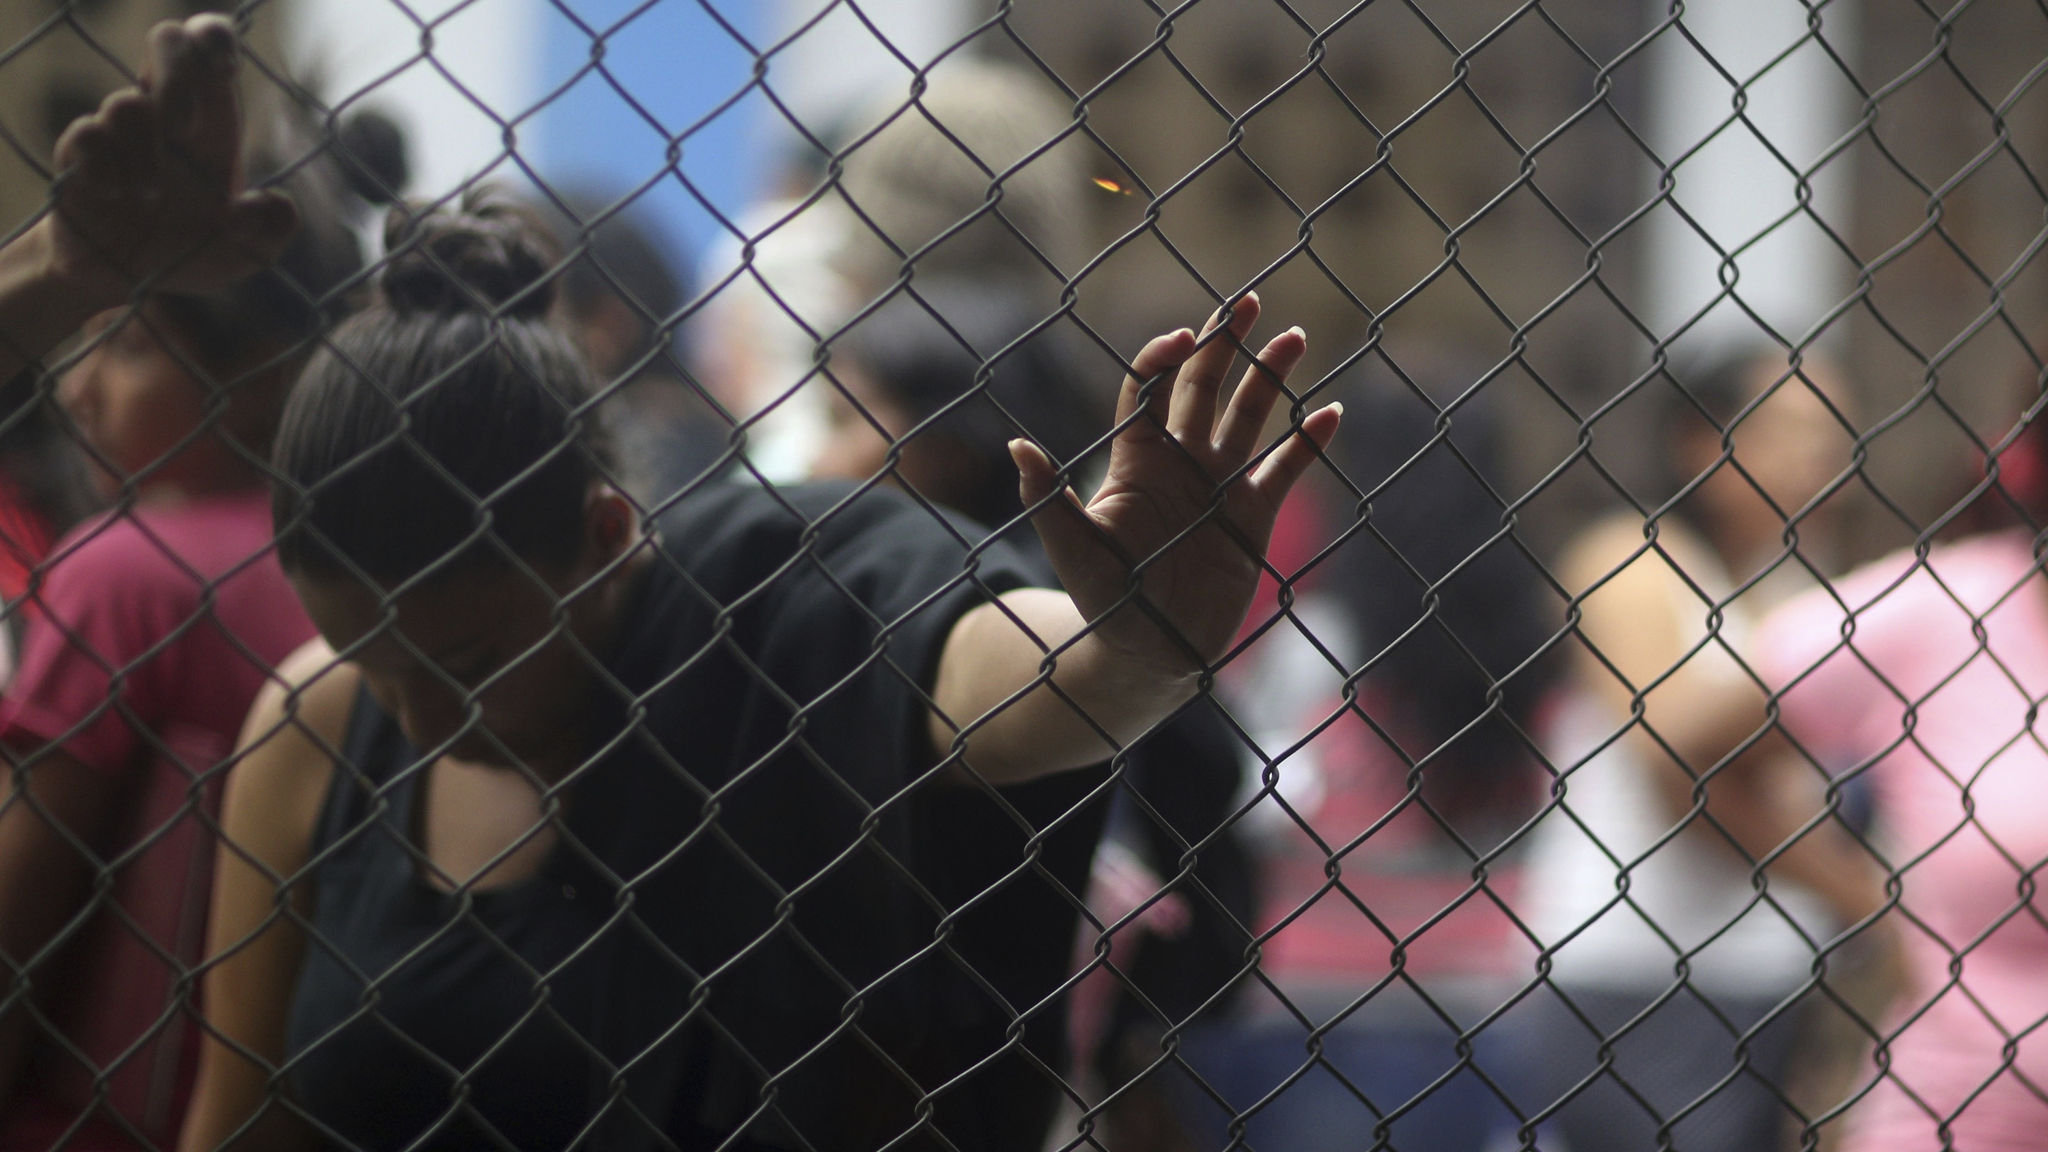 Chile threatens Venezuela with blockade over crisis